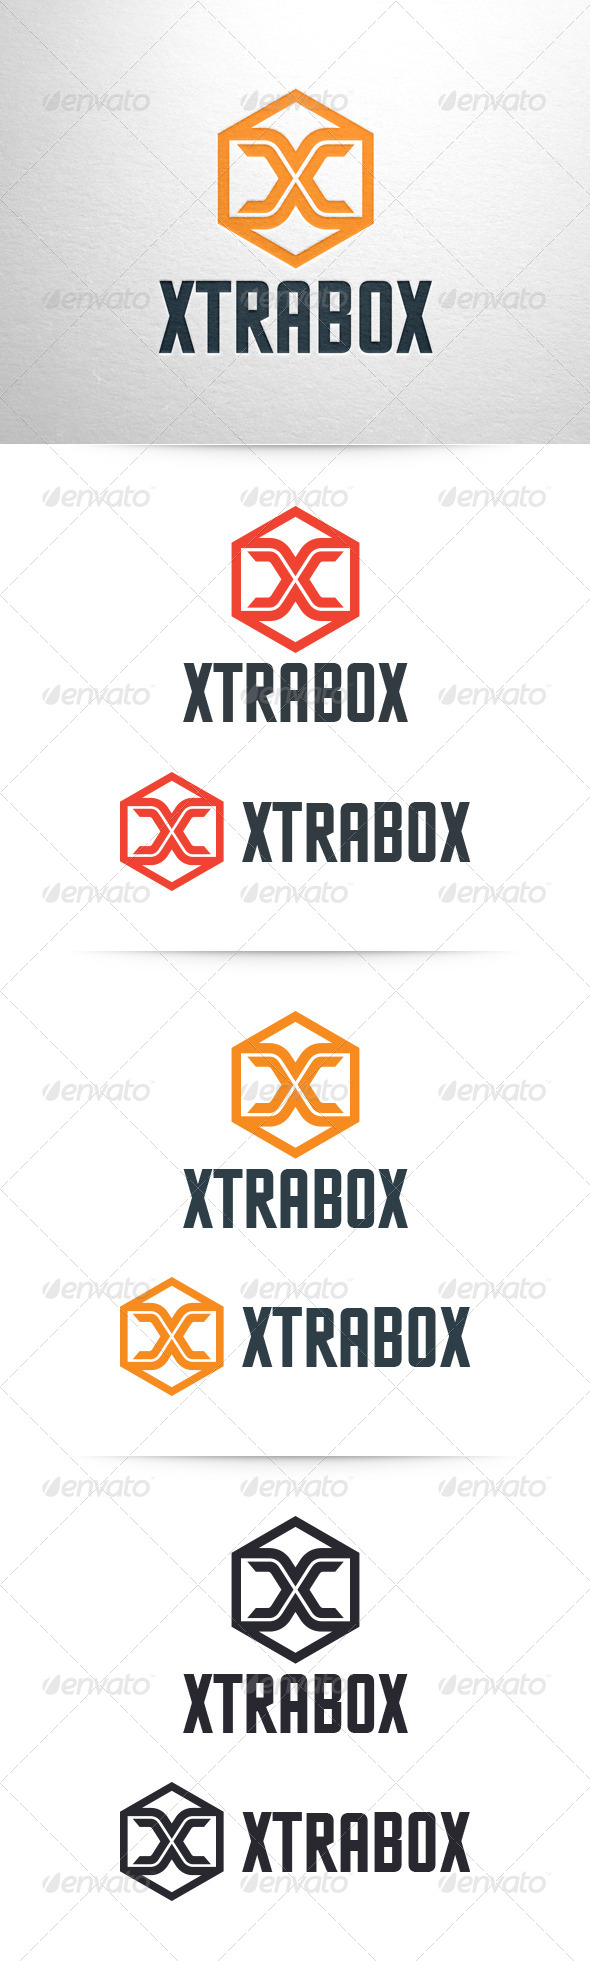 Xtrabox - Letter X Logo Template